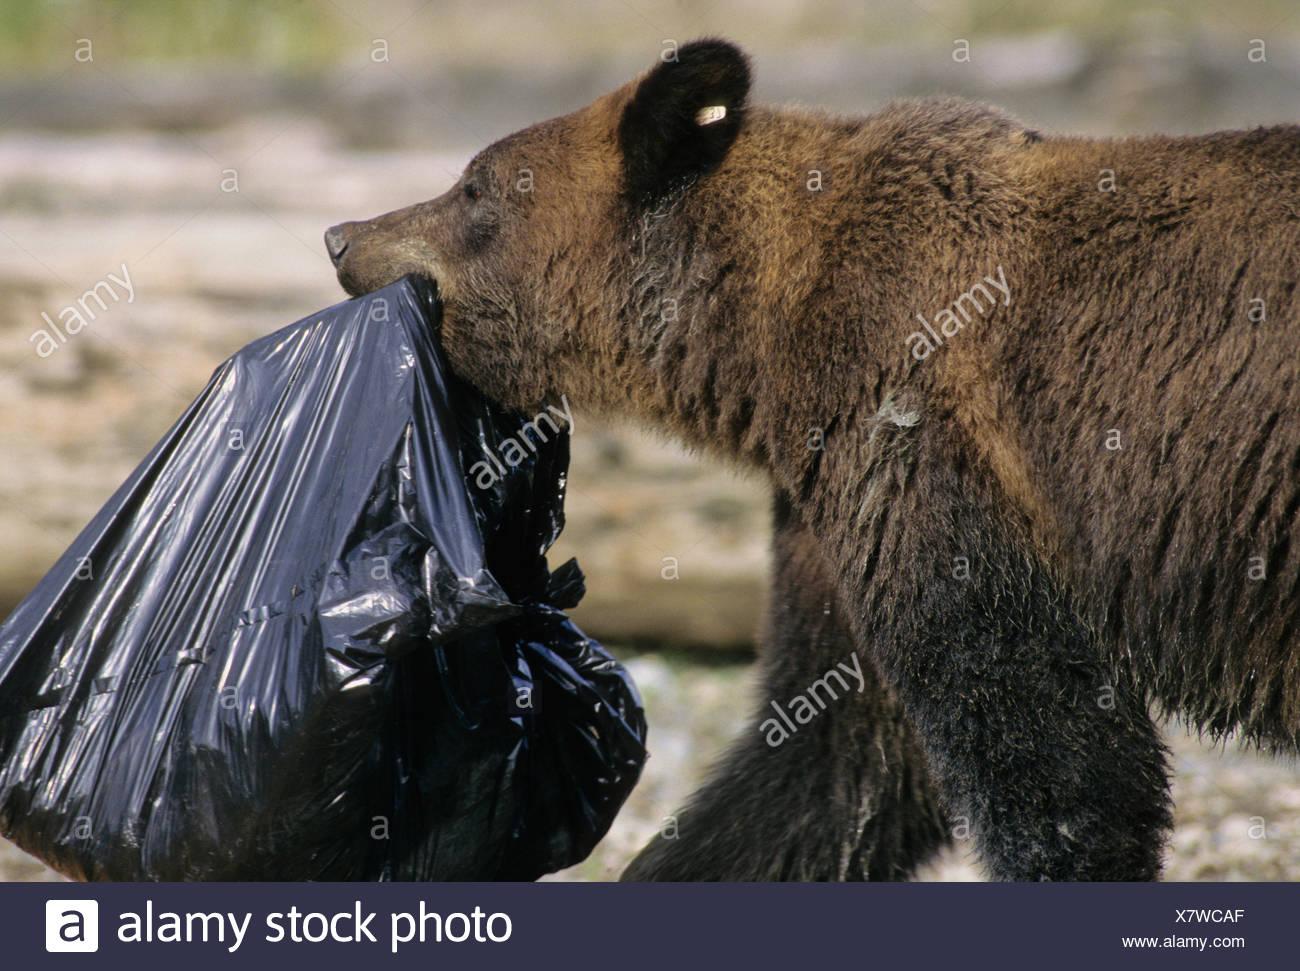 scavenge the dump stock photos & scavenge the dump stock images - alamy